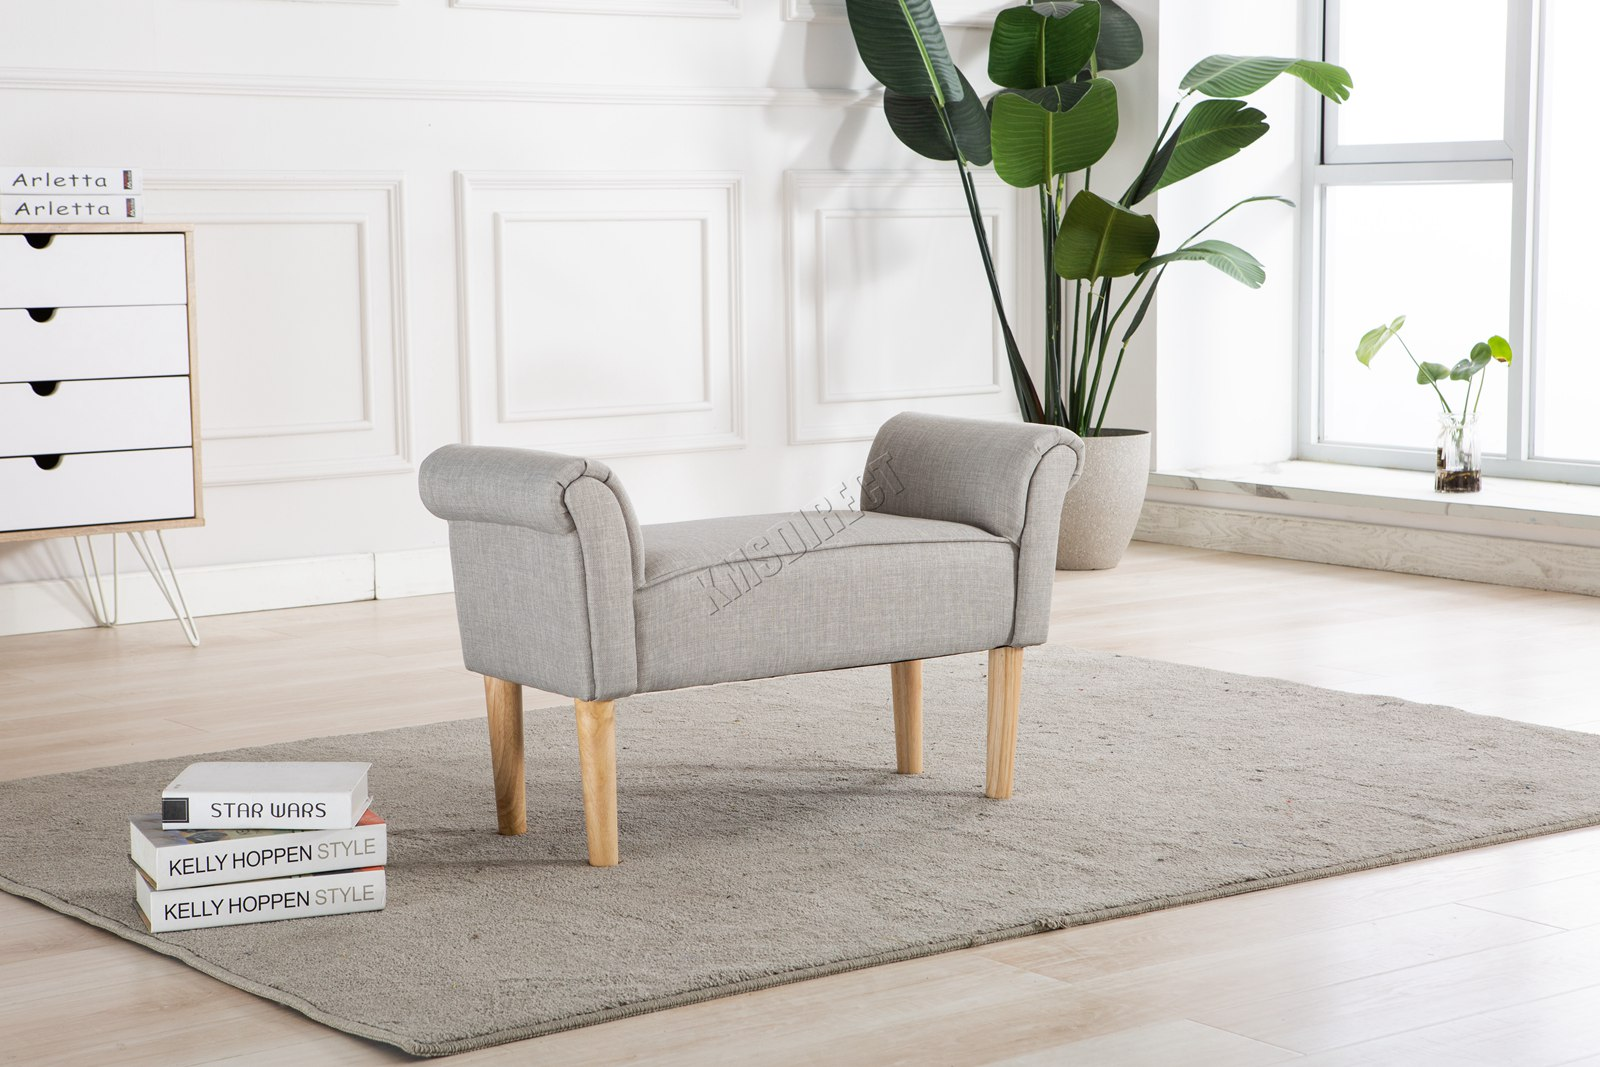 Westwood fabric bench footstool seat pouf pouffee ottoman stool bedroom lounge ebay - Pouf camera da letto ...